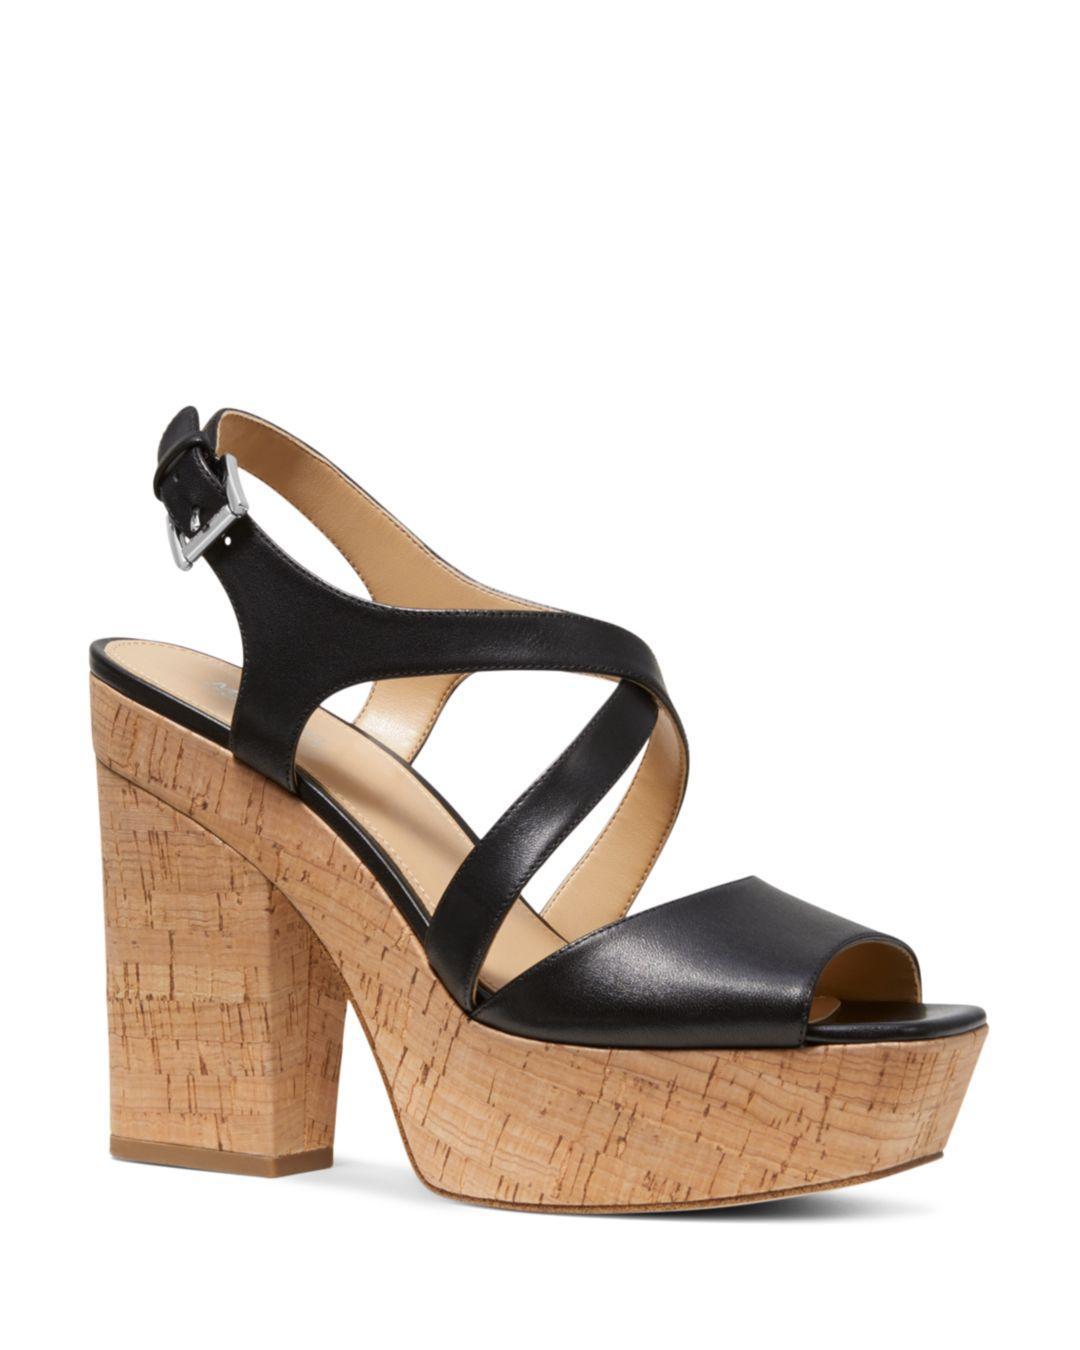 25e2d3fa084 MICHAEL Michael Kors. Black Women s Abbott Leather Platform Wedge Sandals